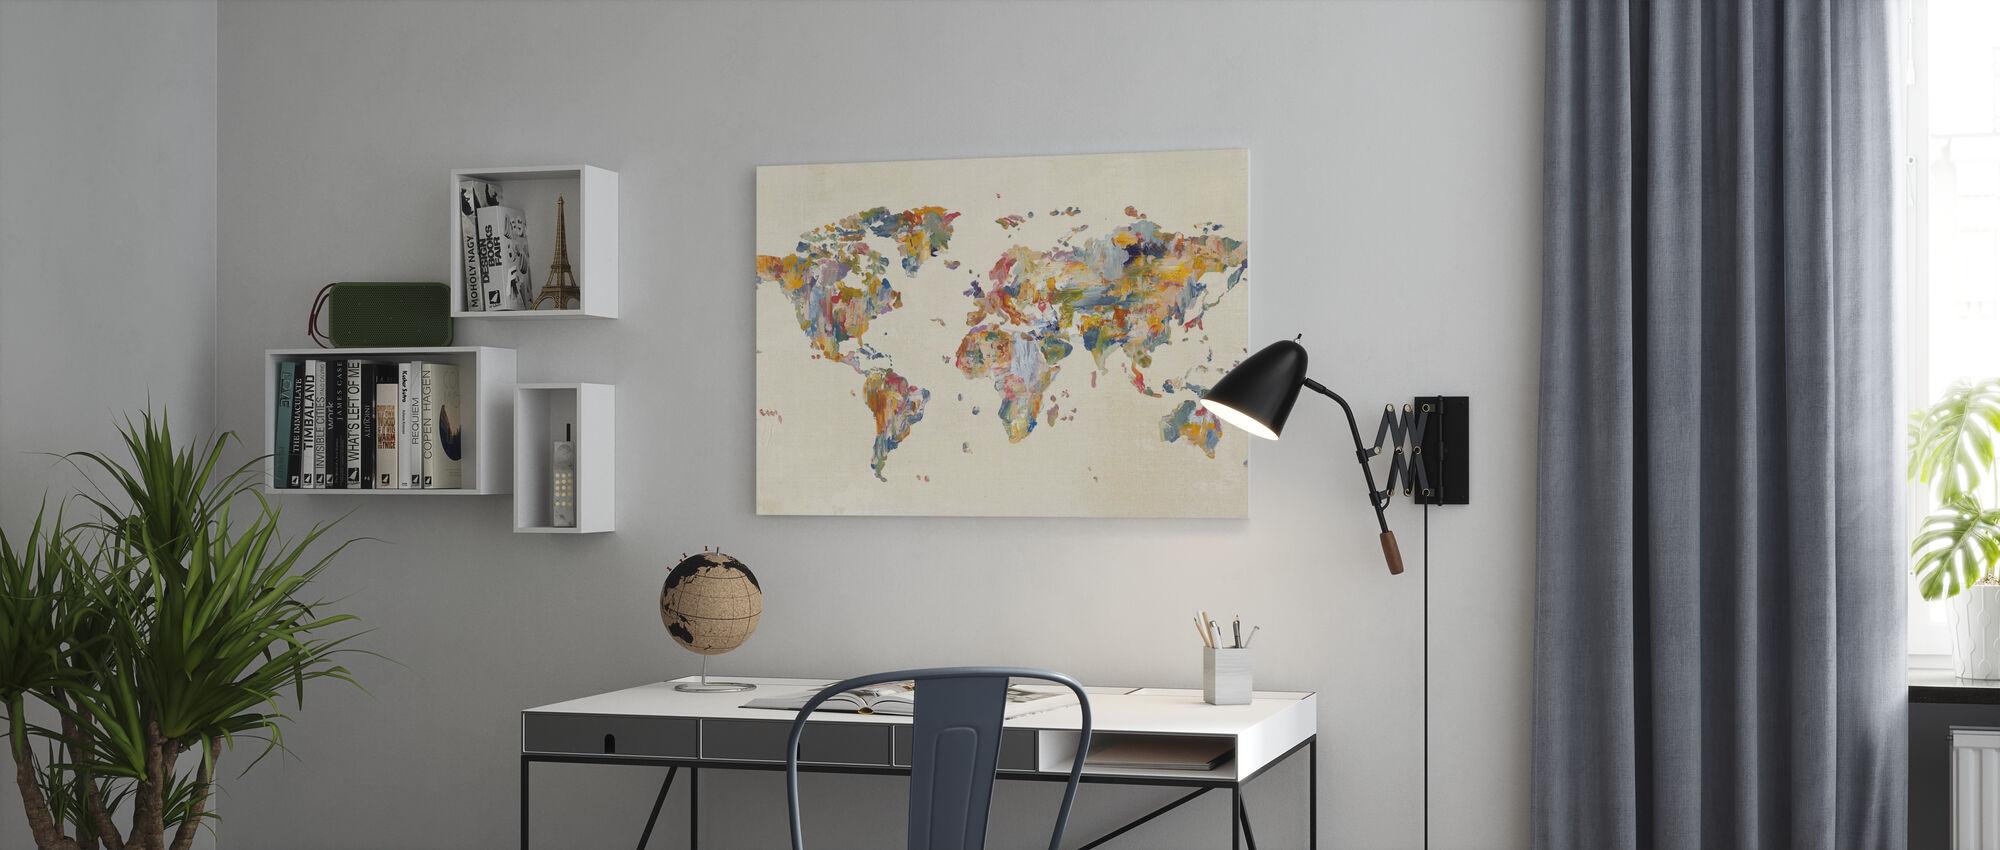 Globale Paletten Karte auf Vintage Linen - Leinwandbild - Büro